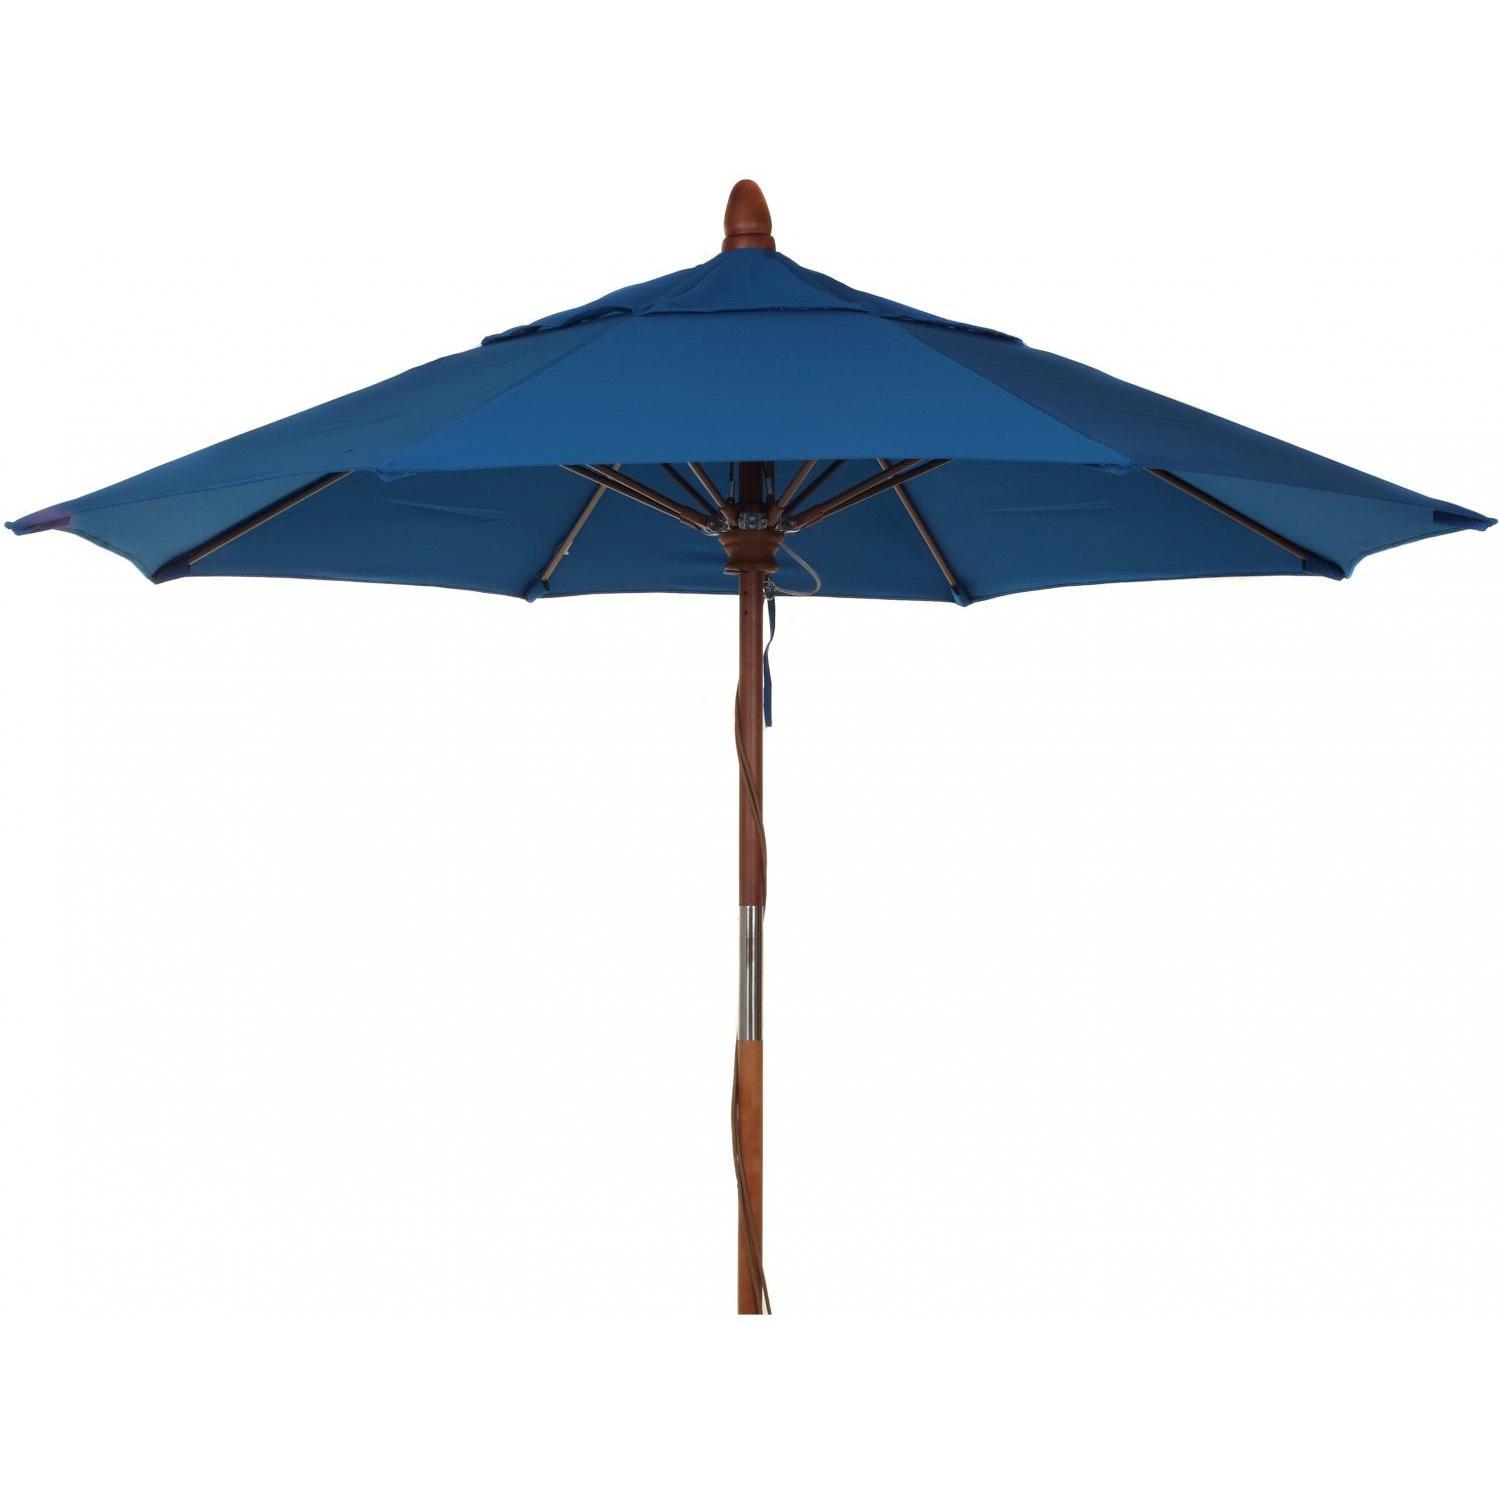 7 Ft Wood Patio Umbrella - Pacific Blue 2848340